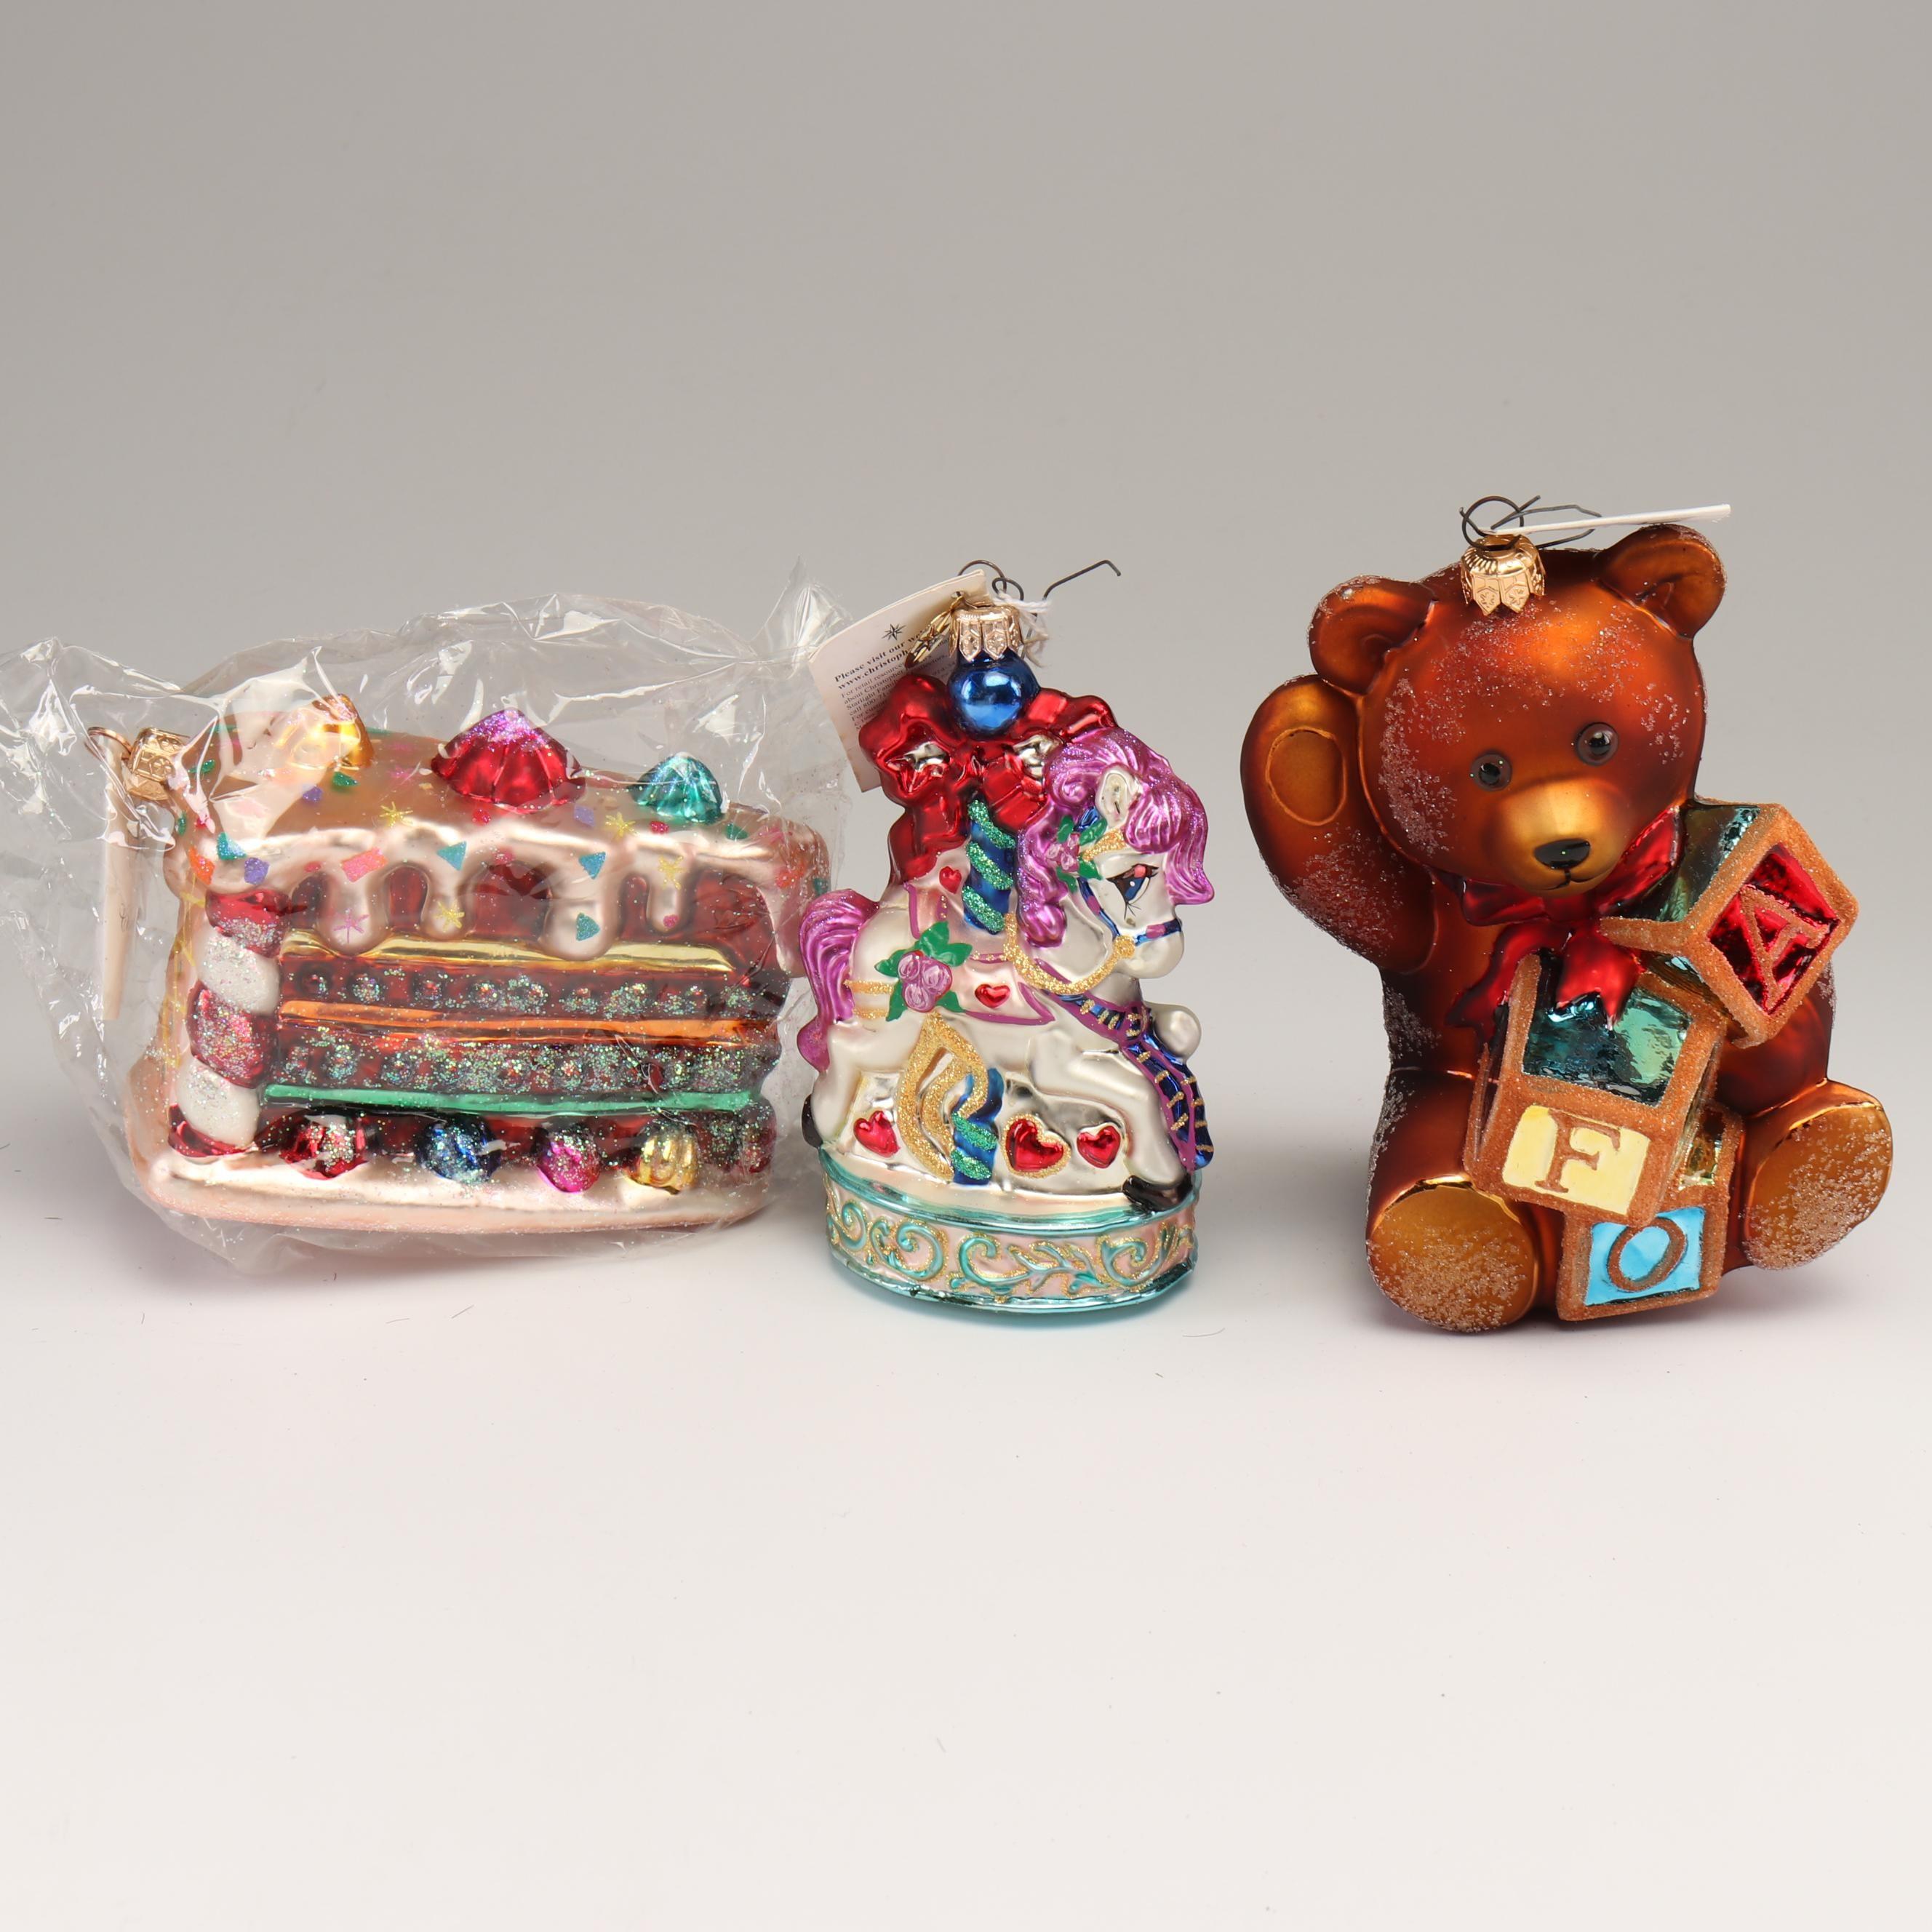 Christopher Radko Glass Ornaments